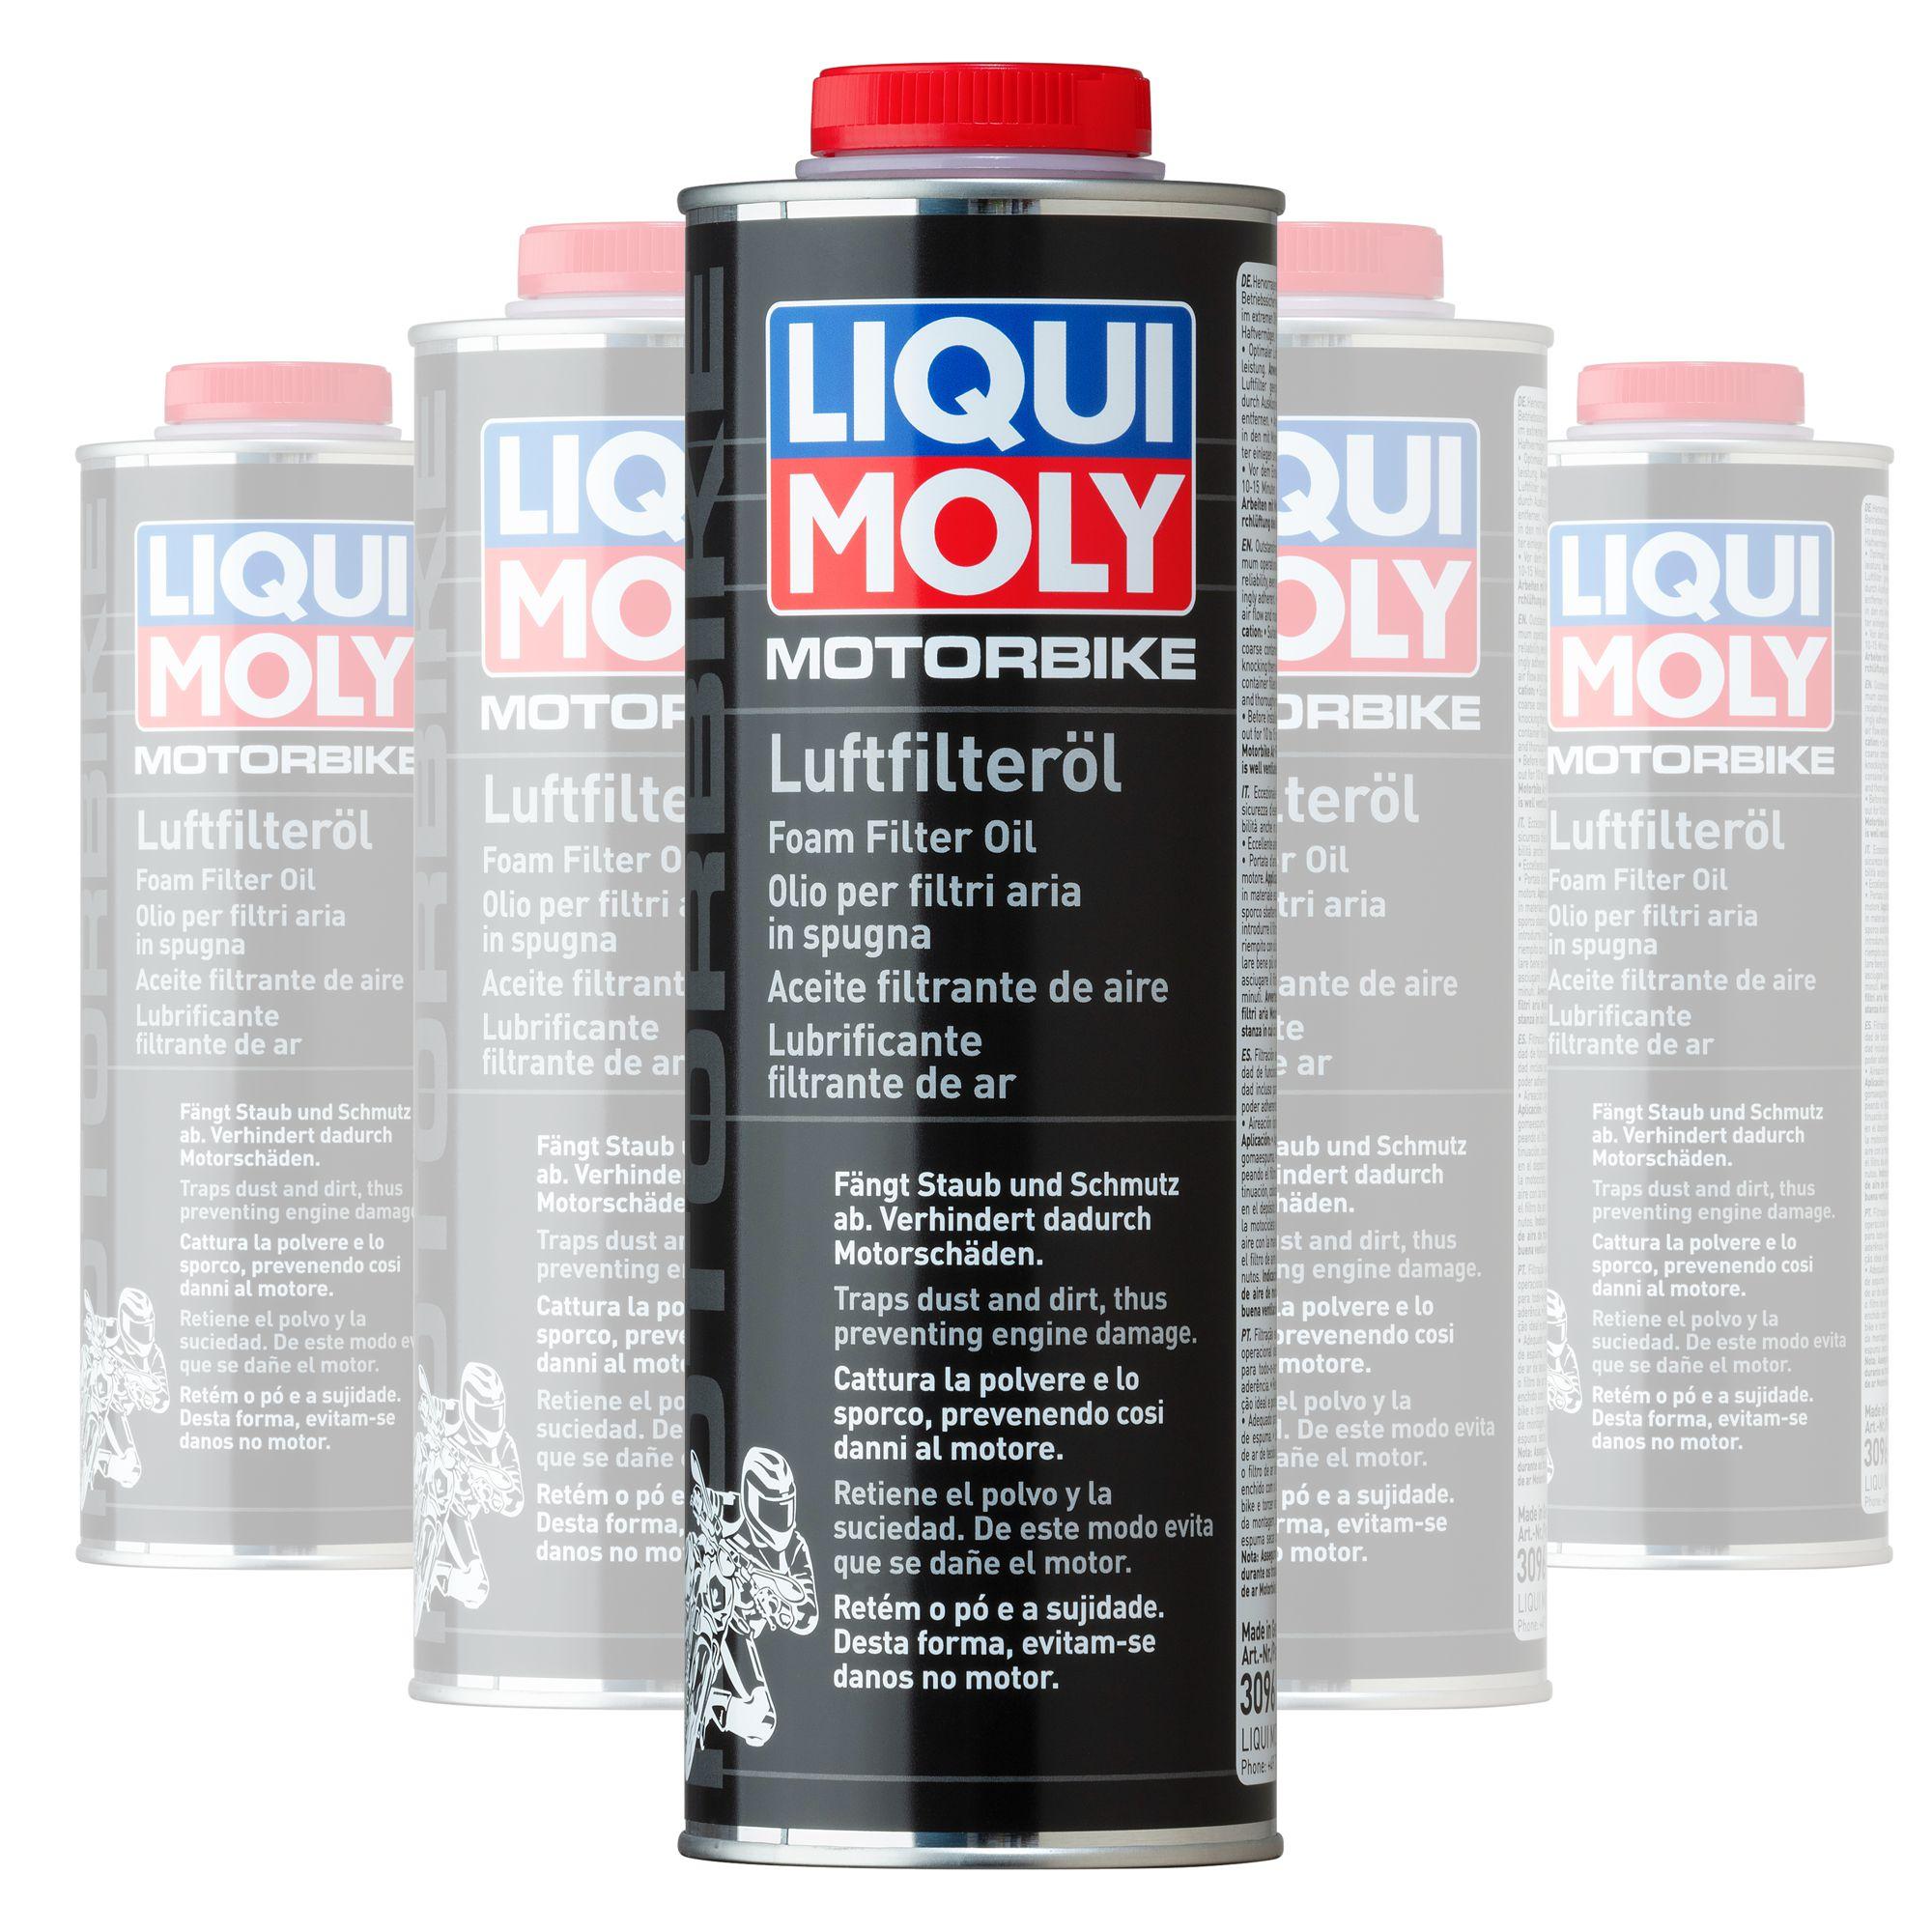 Liquimoly Foam Filter Oil 1L 3096 (Box Qty 6)